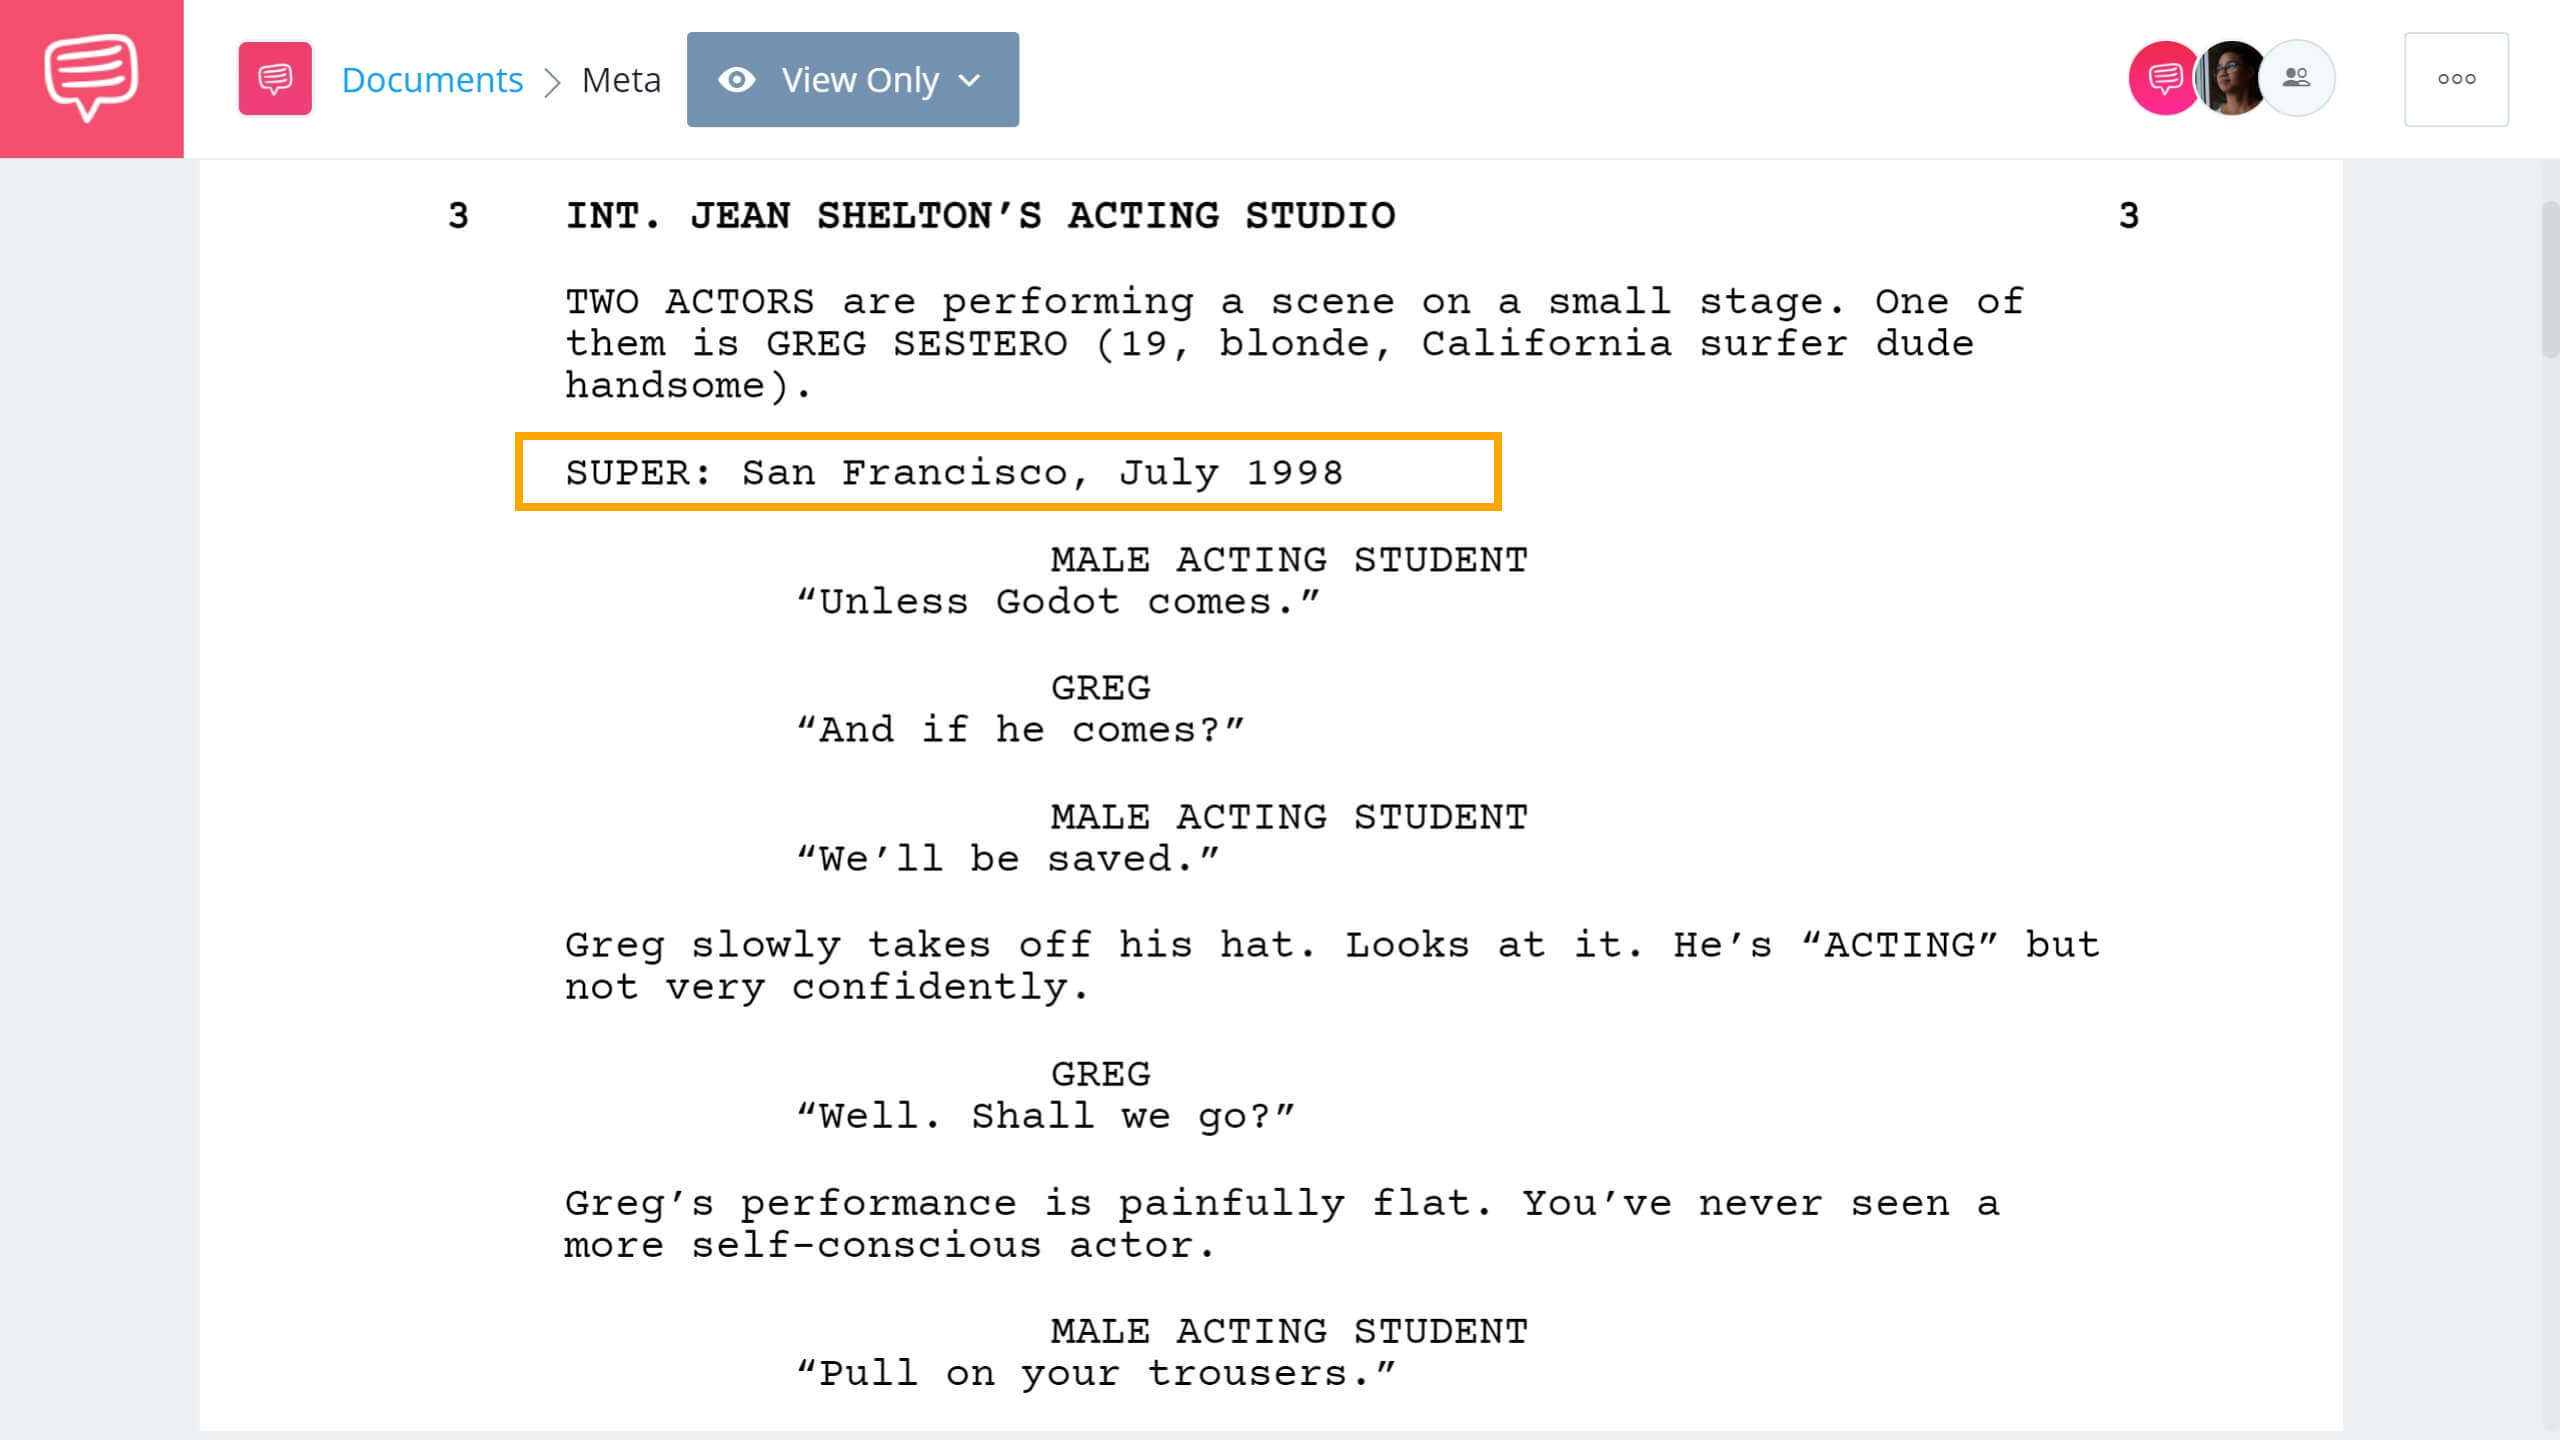 Screenwriting Terms - Super Example - StudioBinder Screenwriting Software